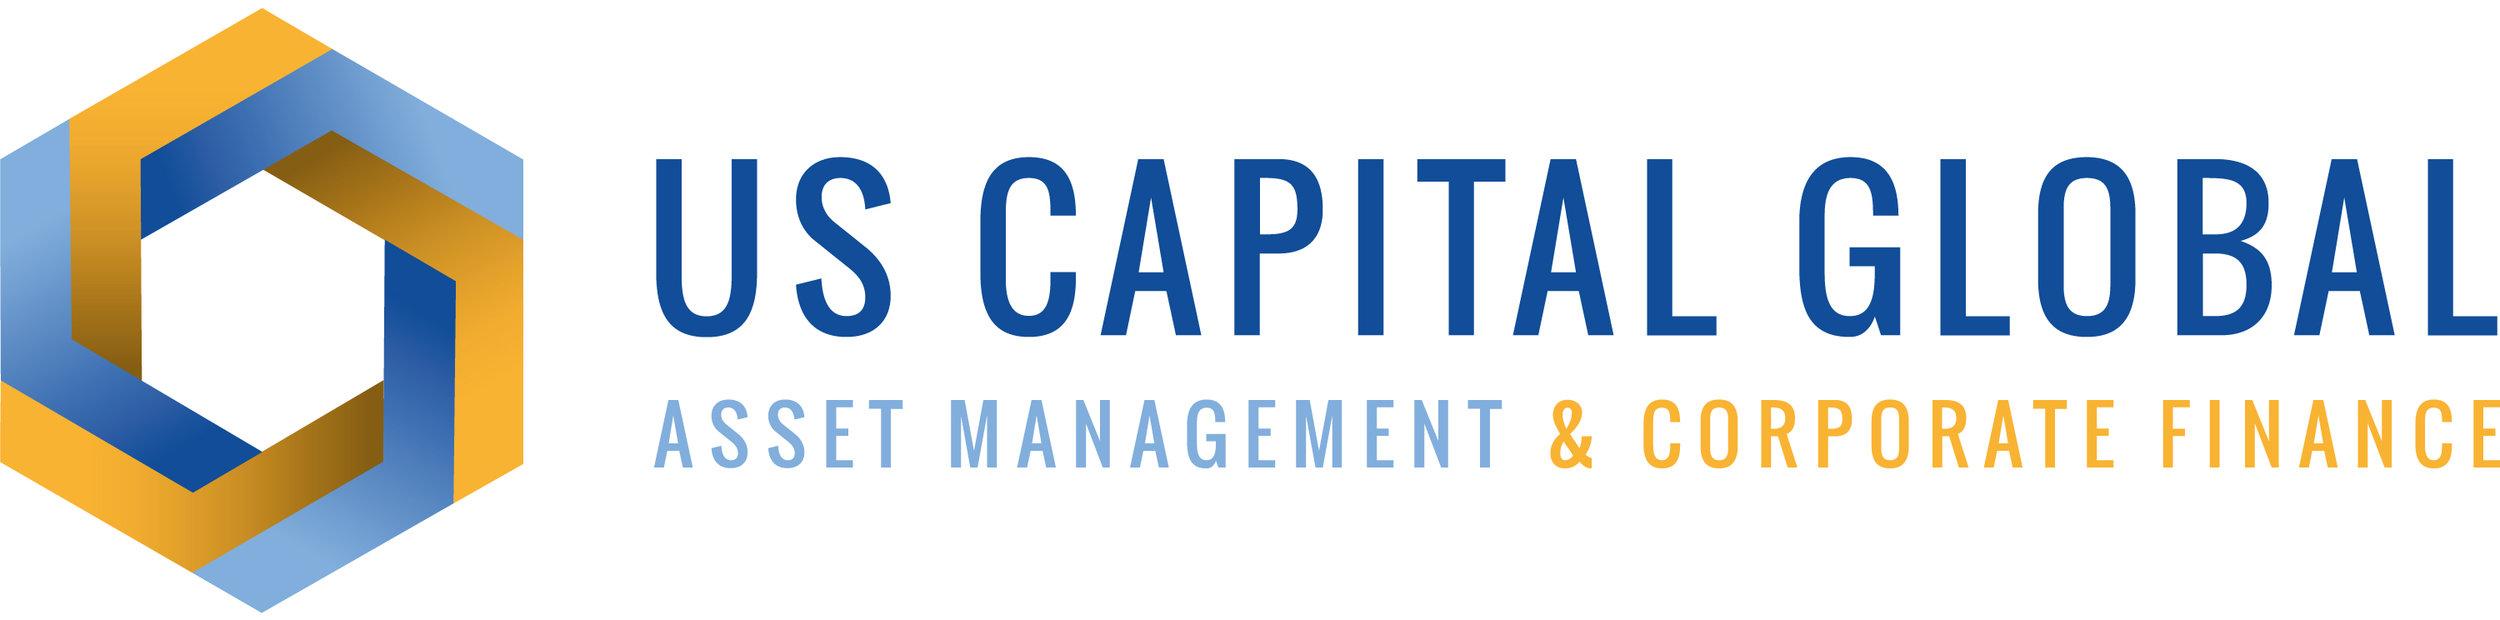 US Capital Global